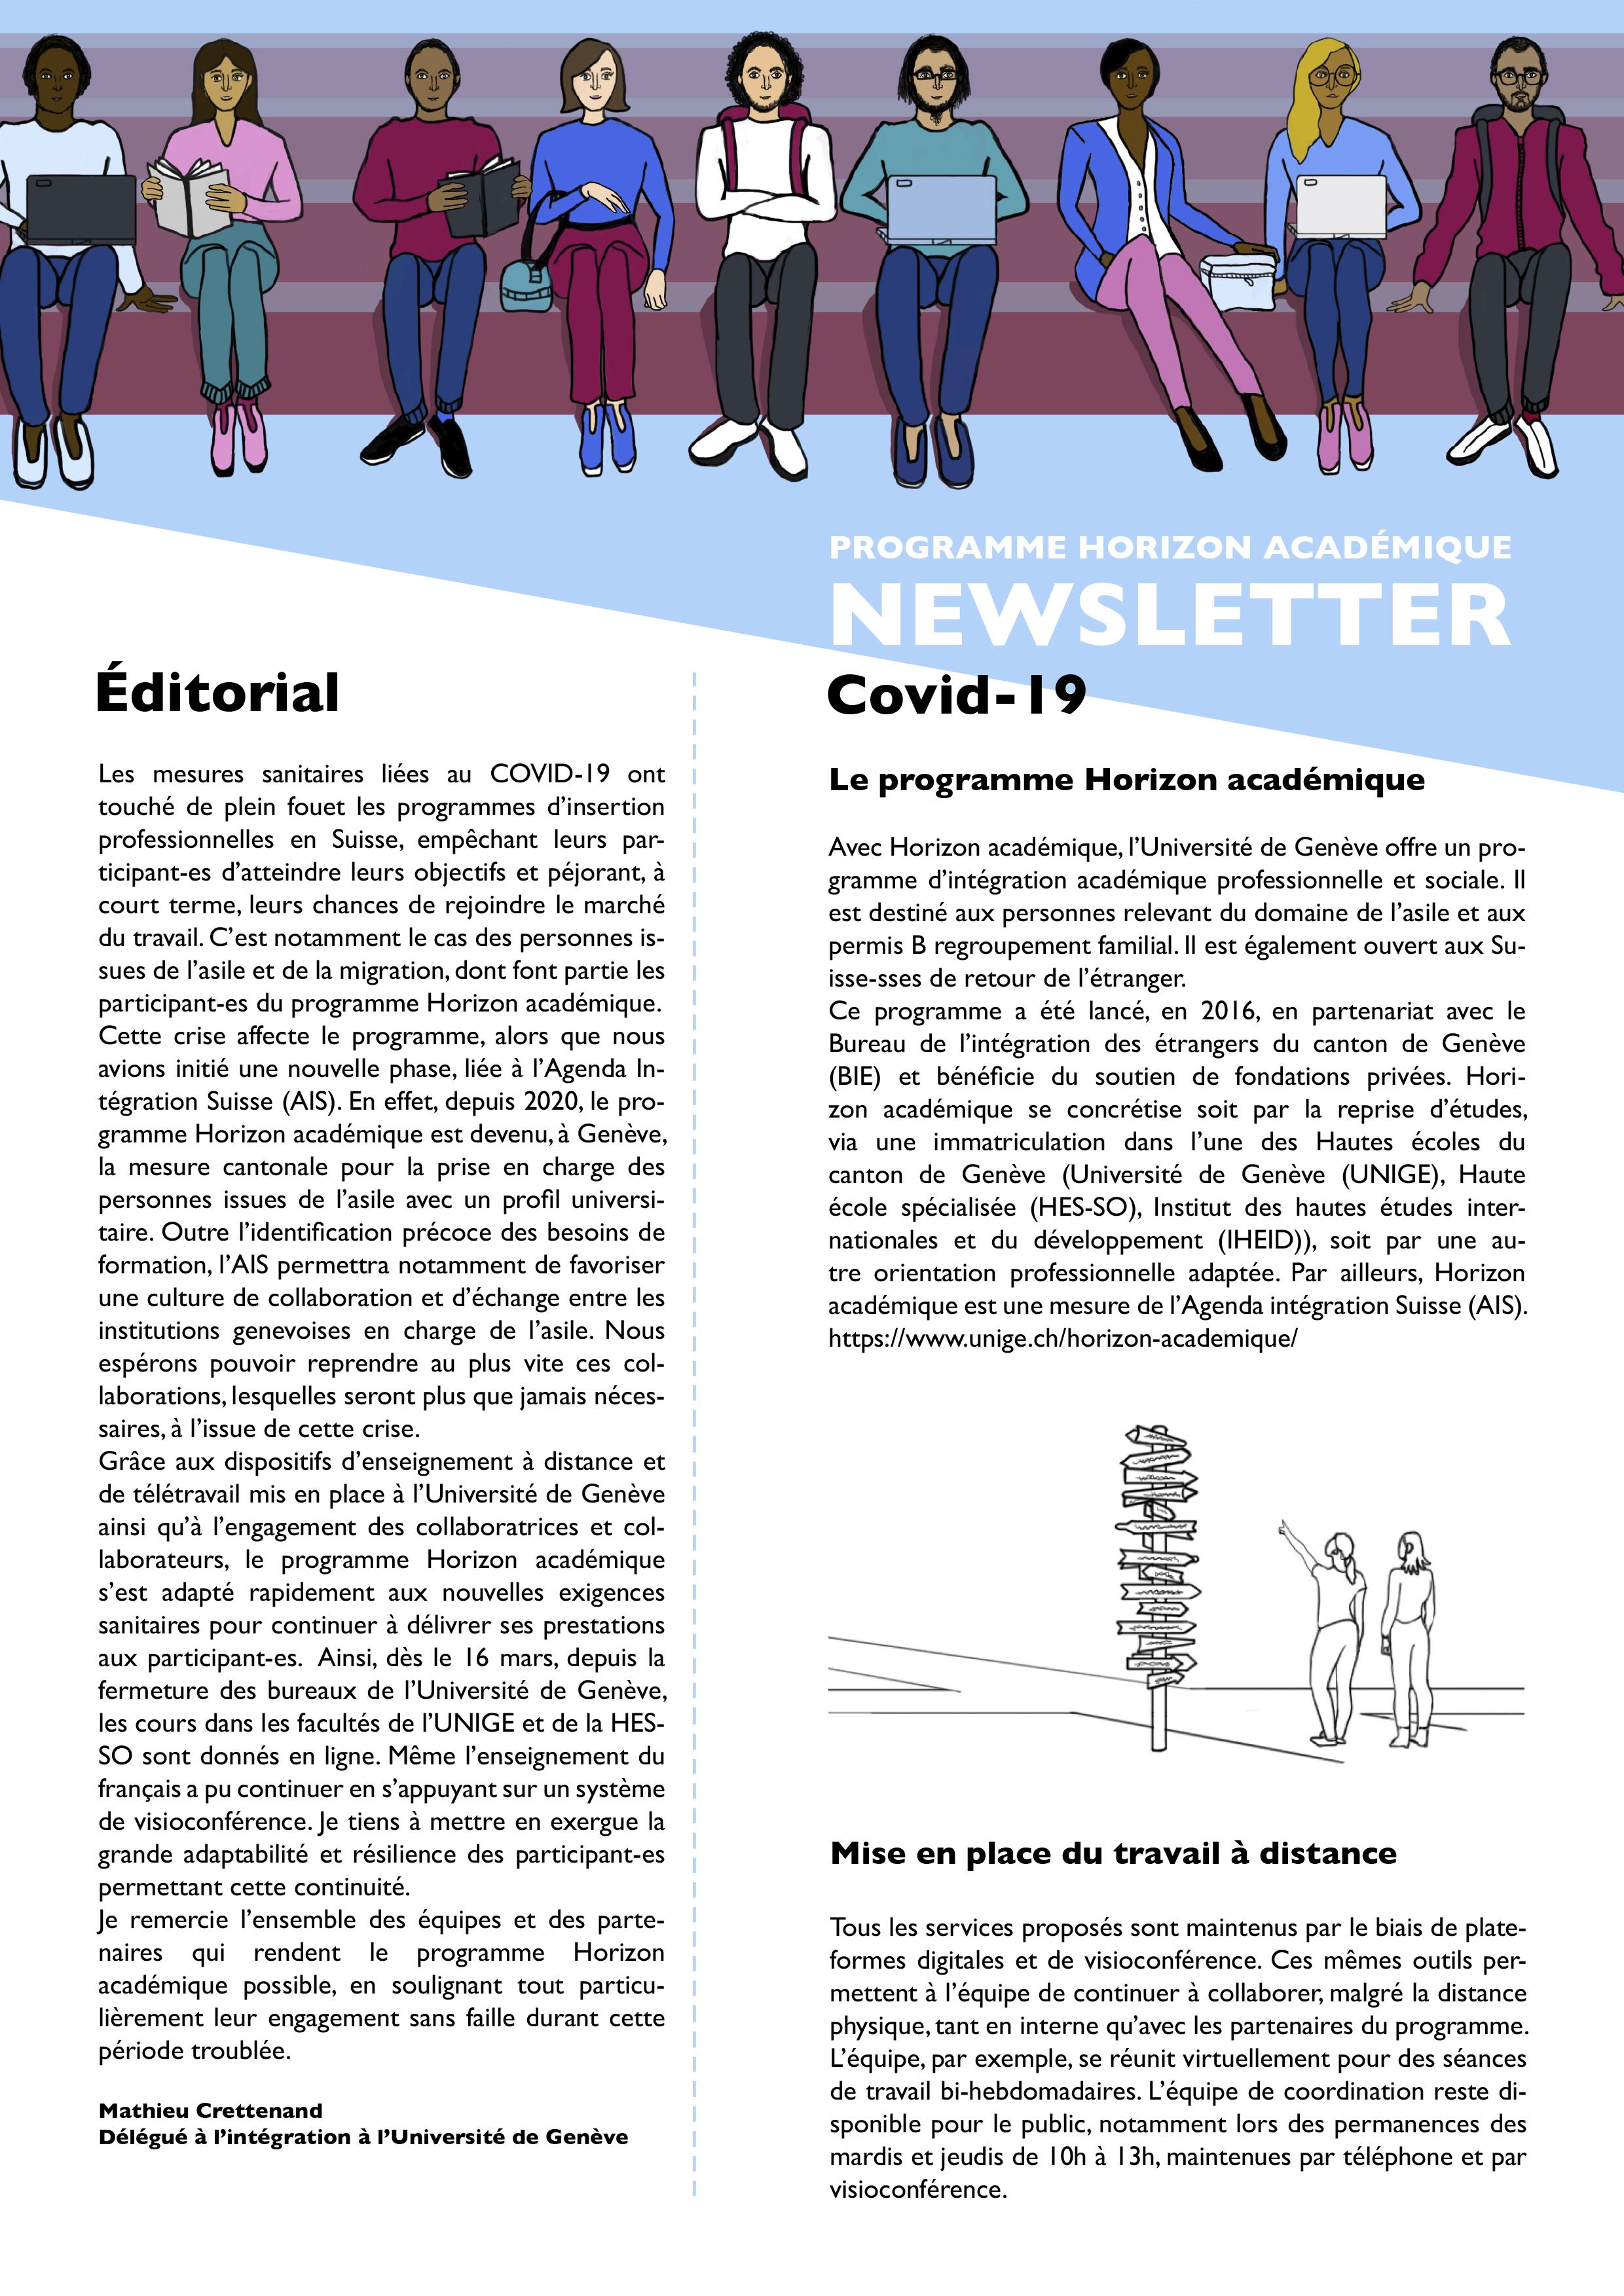 Newsletter covid19 Horizon Académique